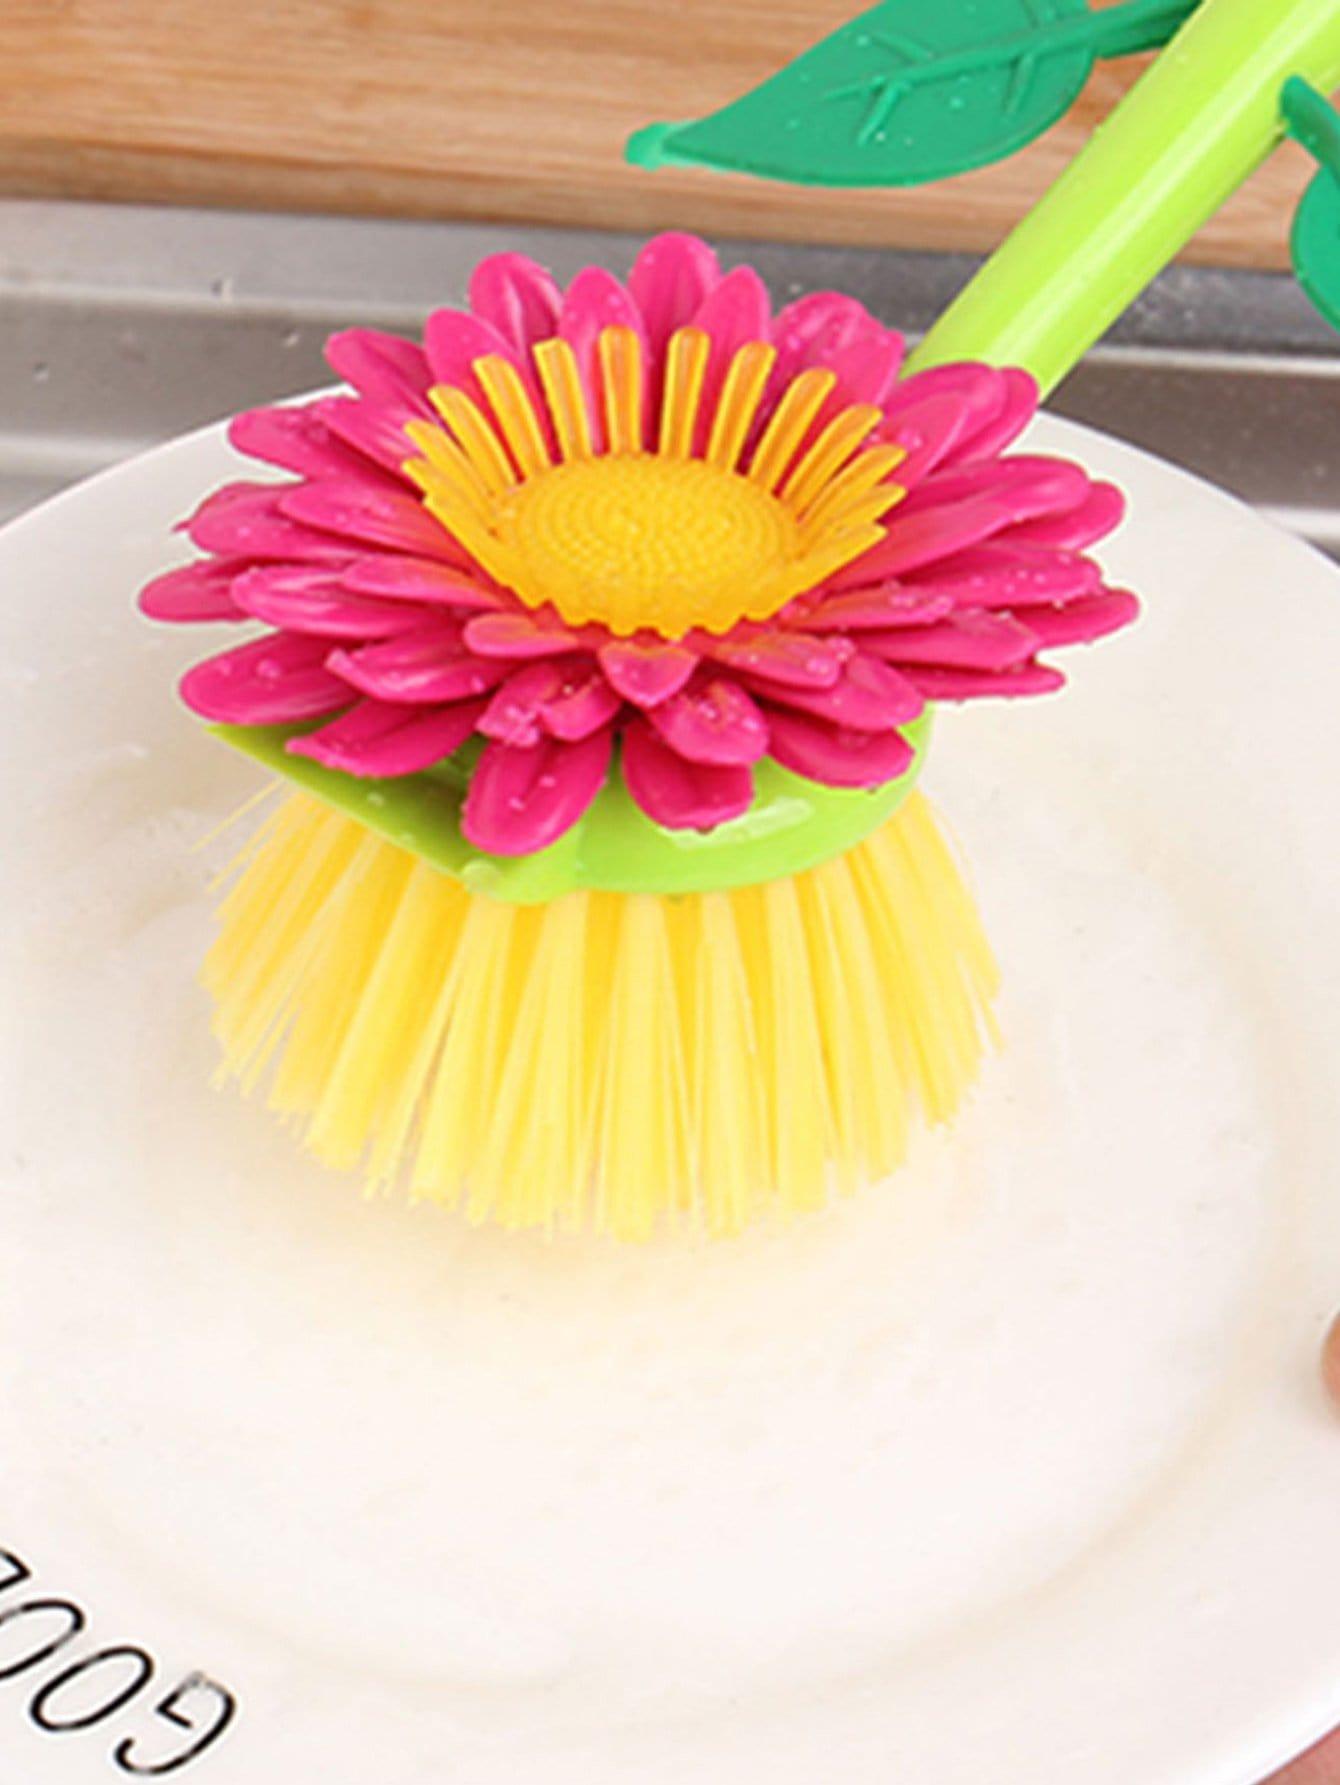 Sunflower Shaped Cleaning Brush